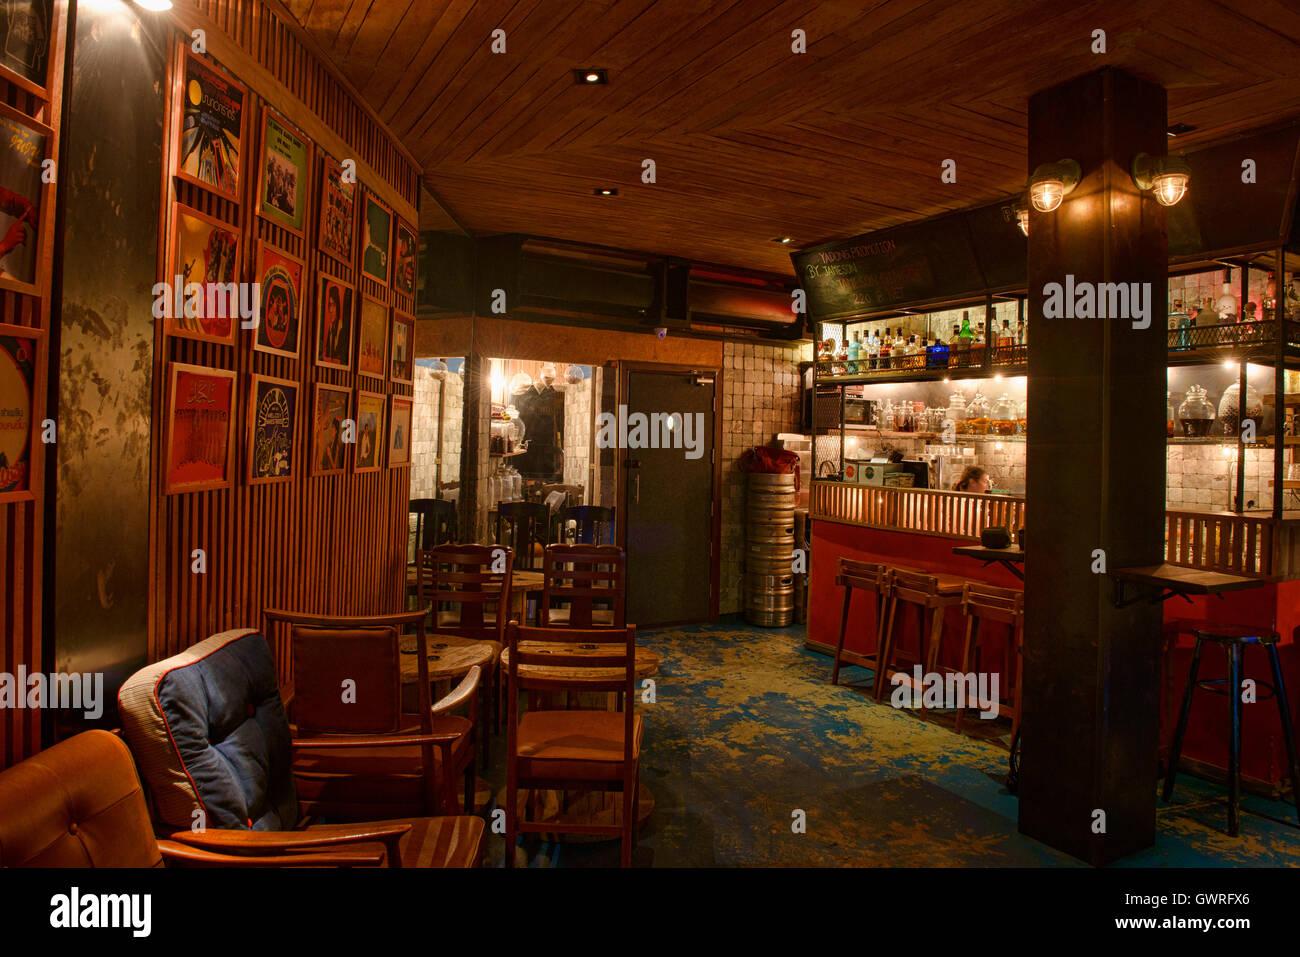 Ya Dong alcools blancs bar à Bangkok, Thaïlande Photo Stock